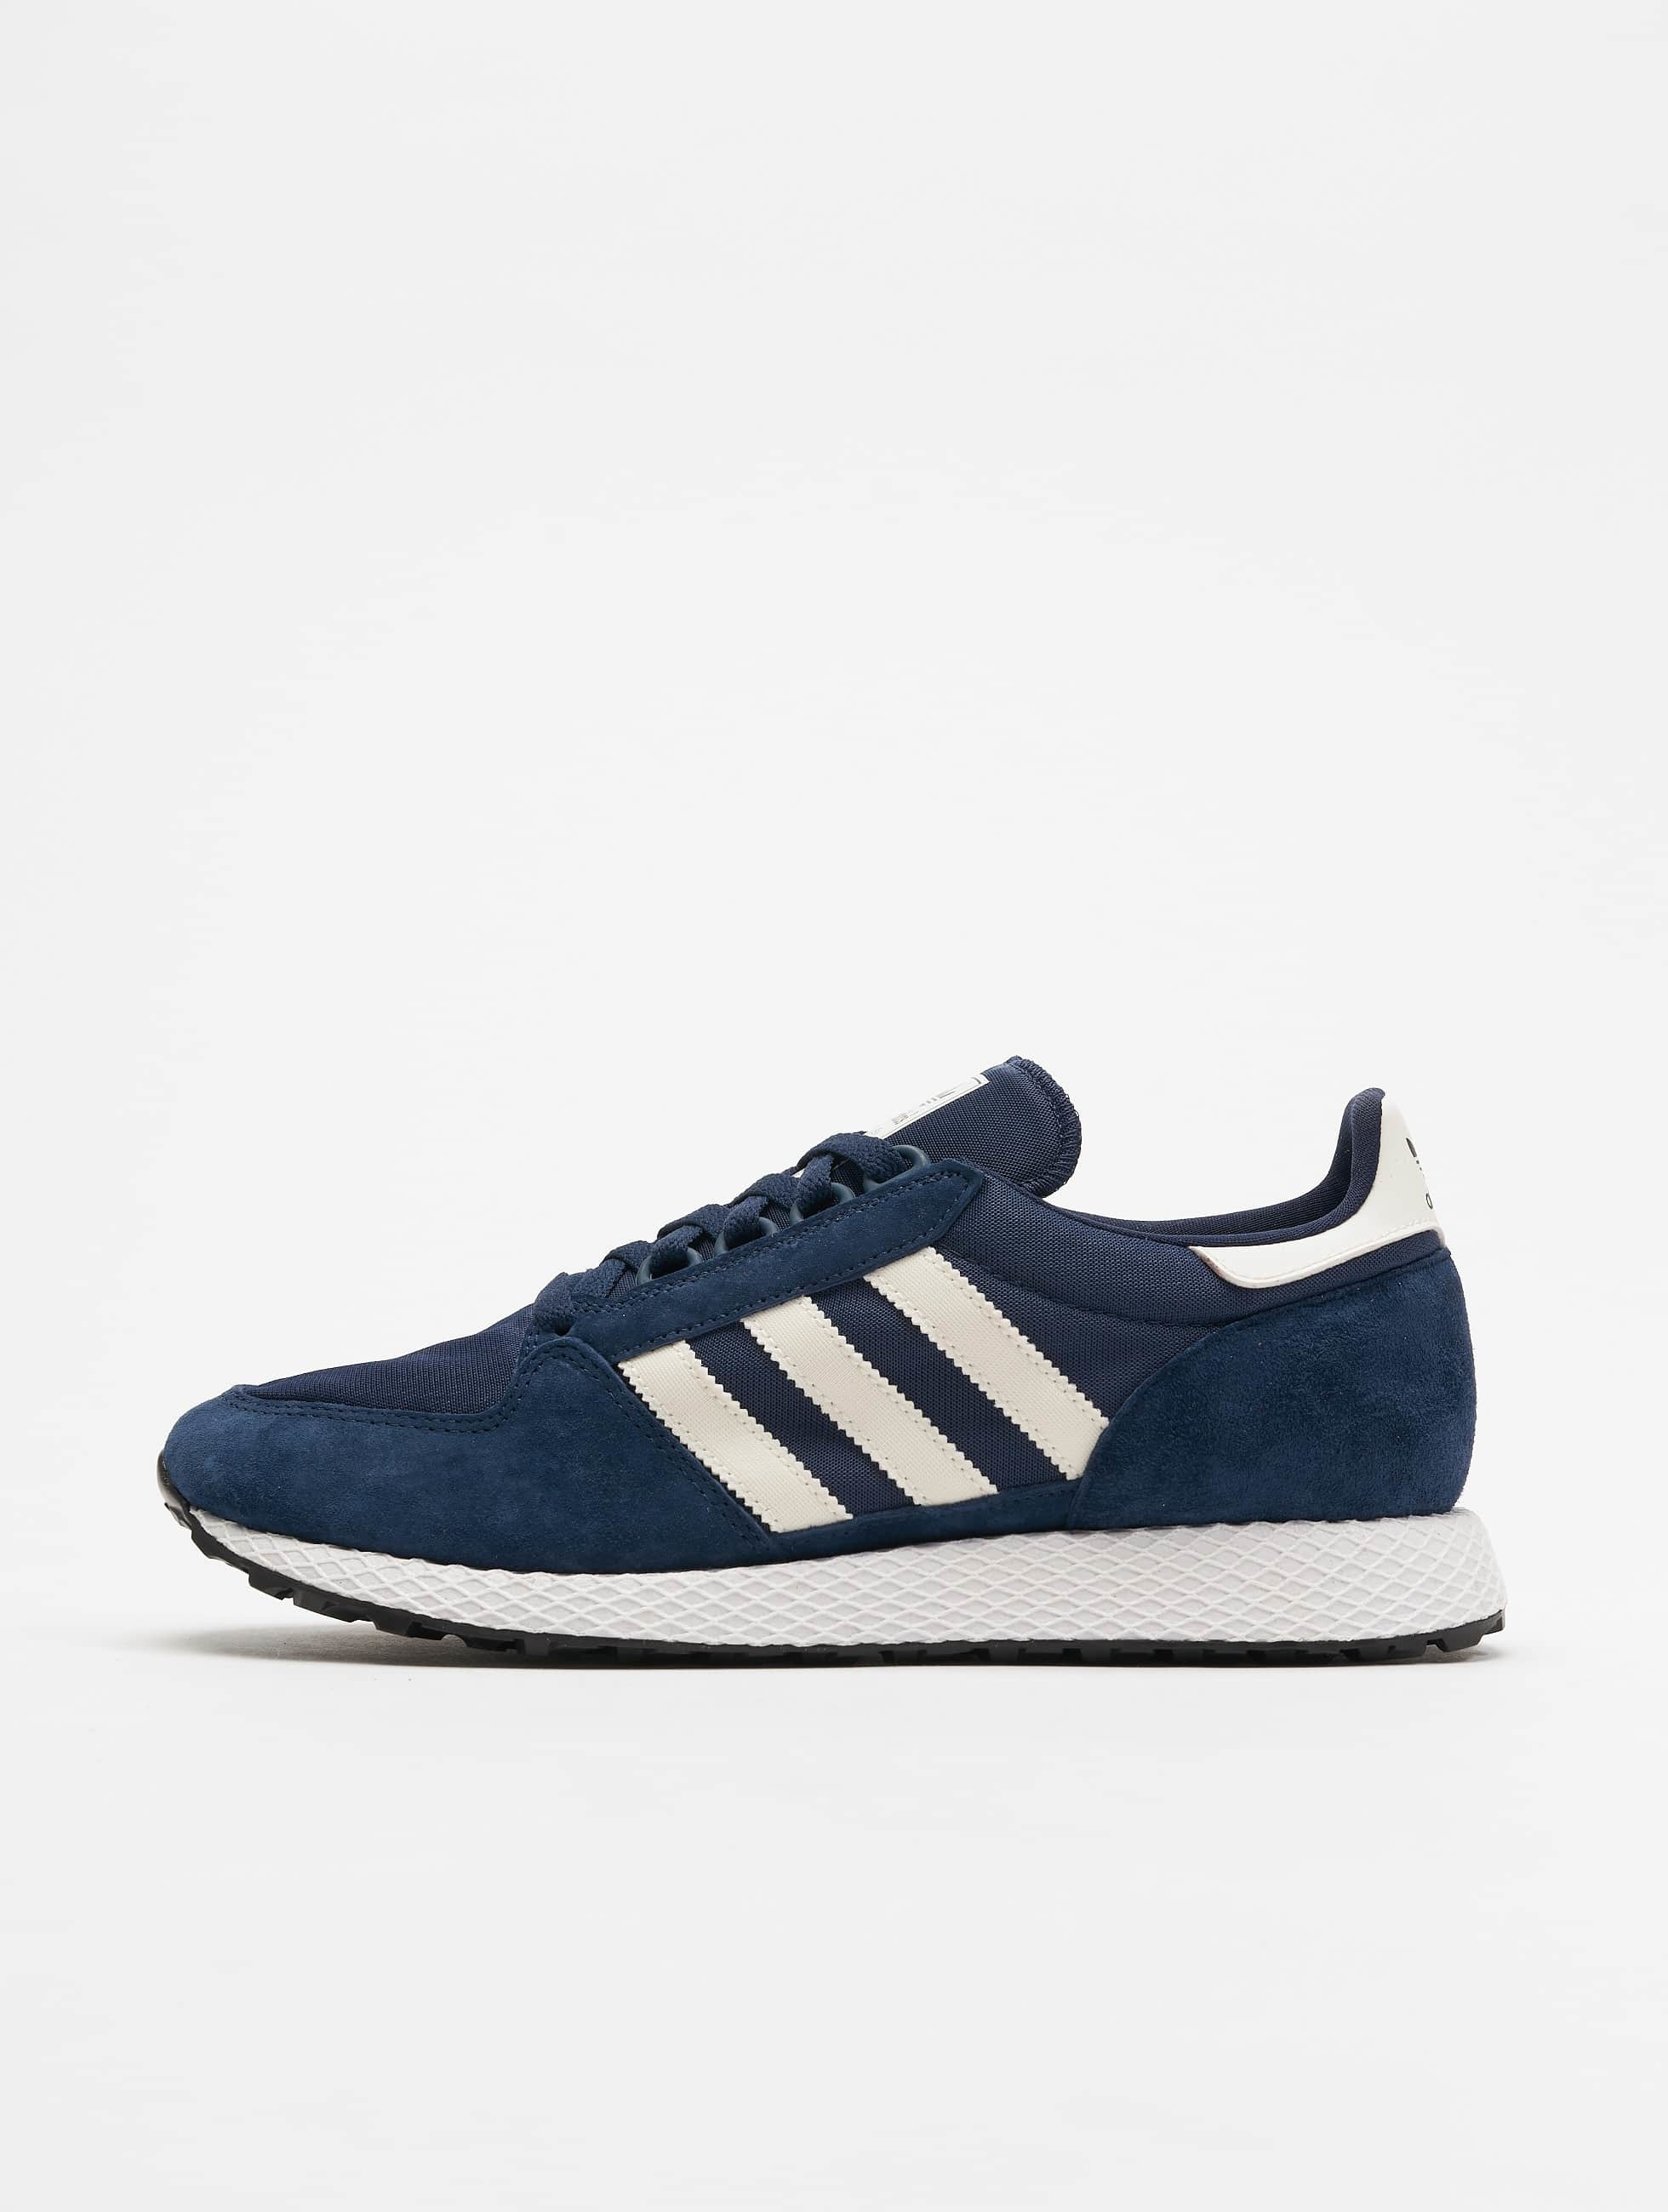 100e6cb1db0 adidas originals schoen / sneaker Forest Grove in blauw 543709